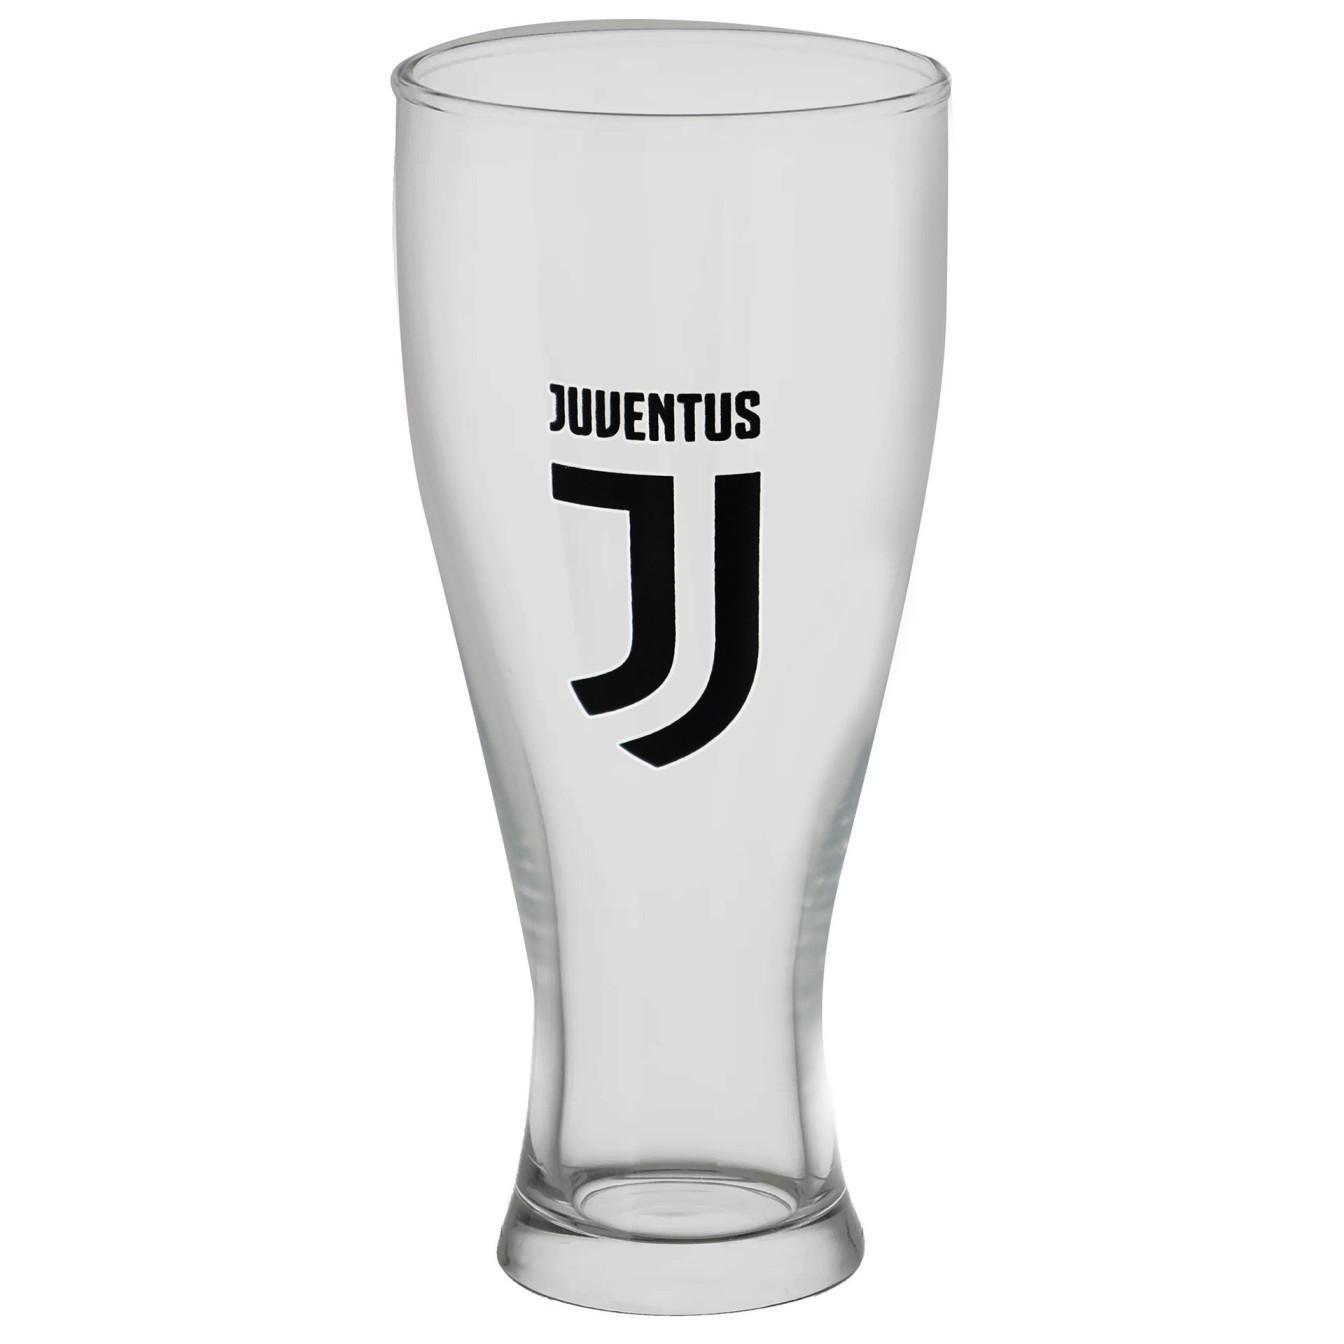 Juventus 14oz Pint Glass